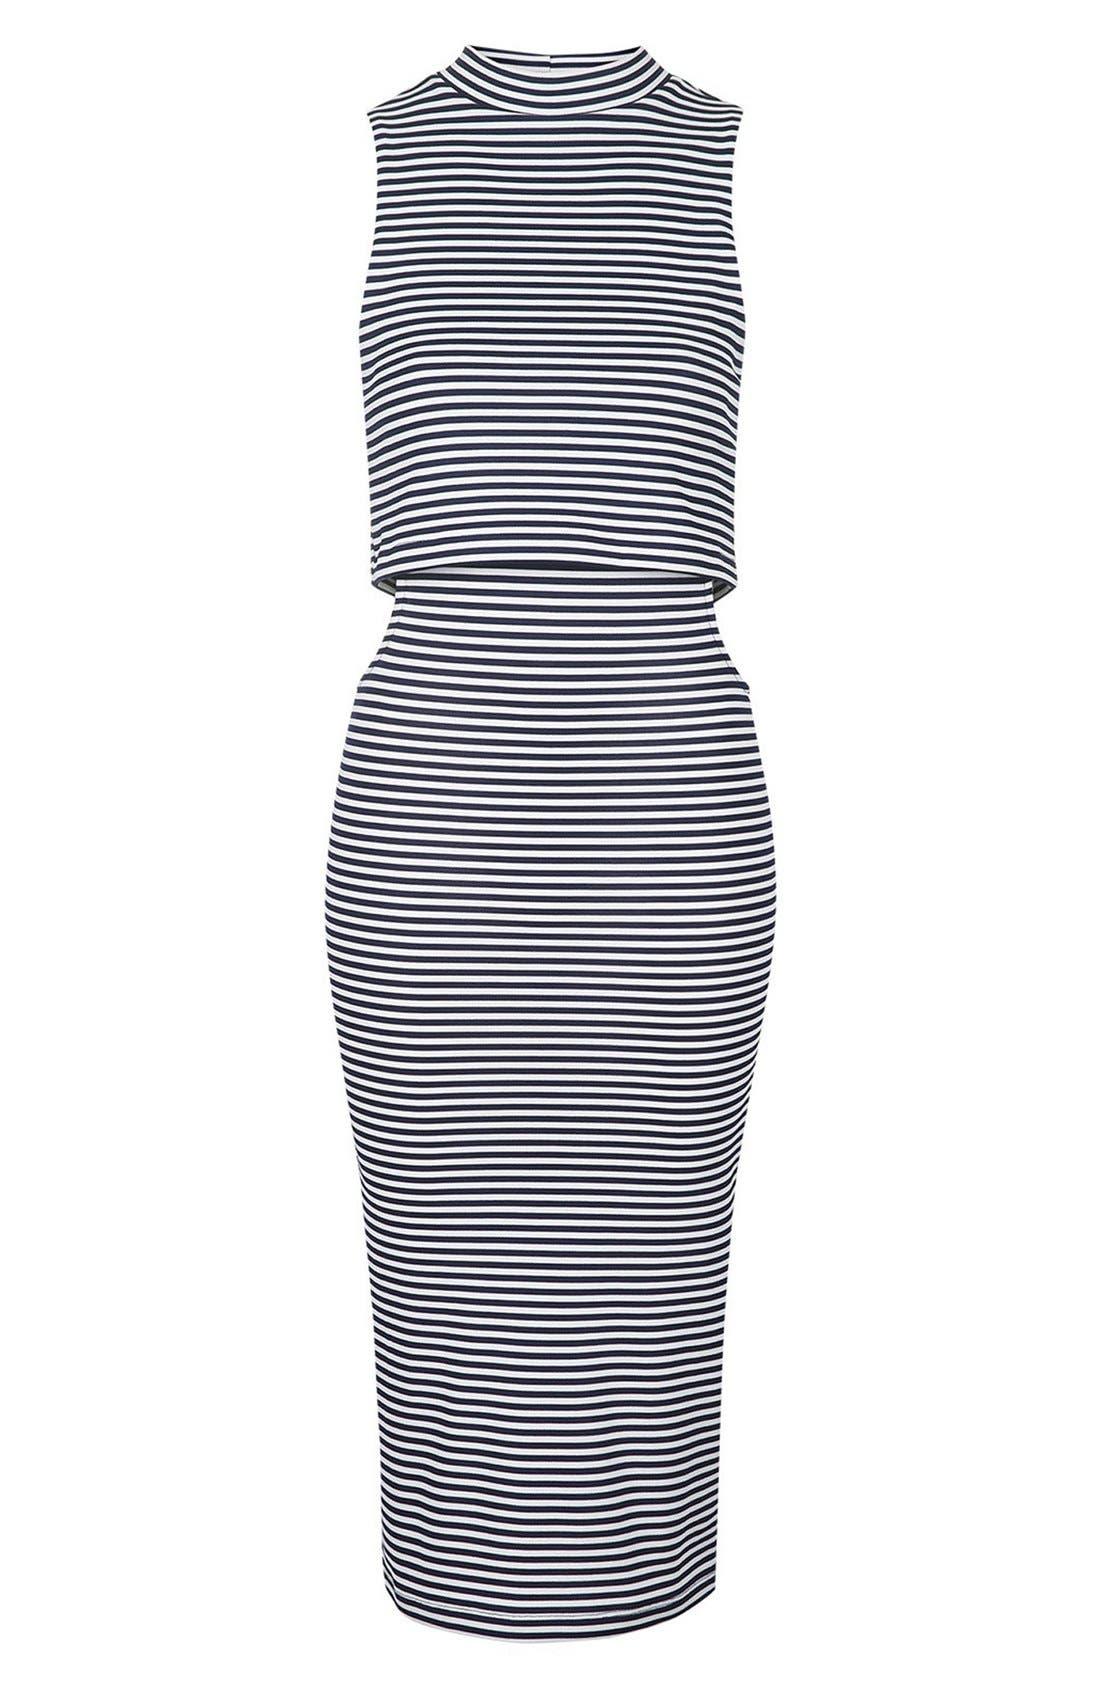 Alternate Image 3  - Topshop Cutout Midi Dress